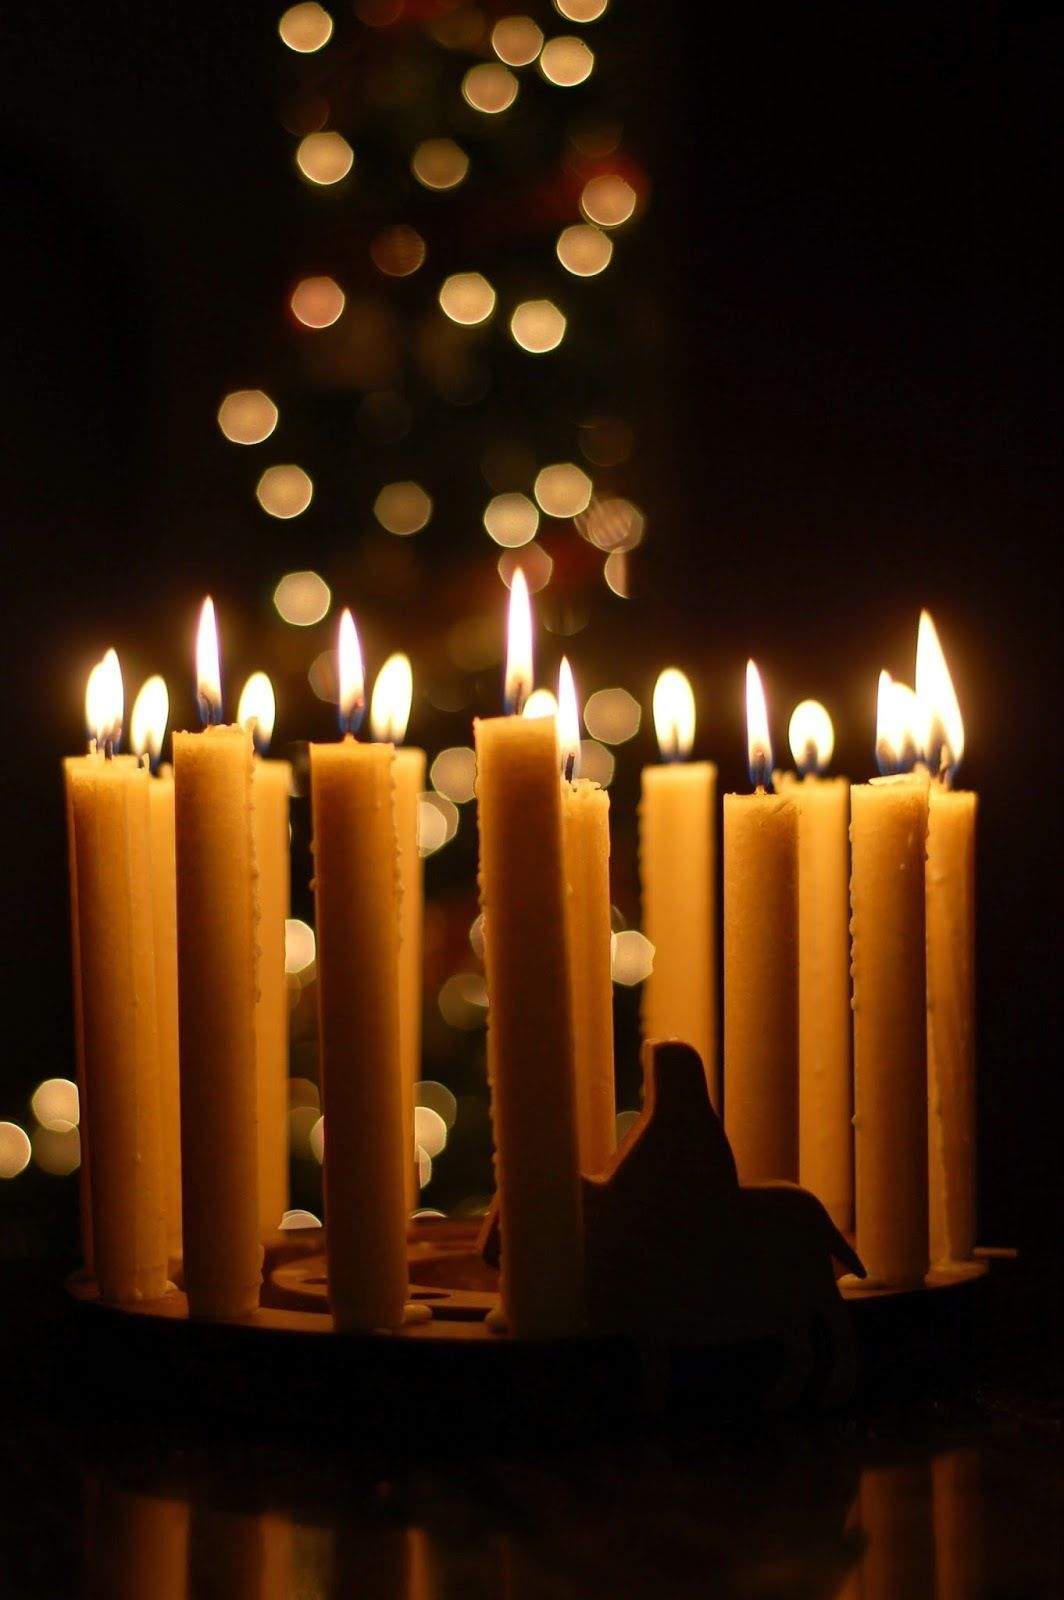 Christ, Light of the World